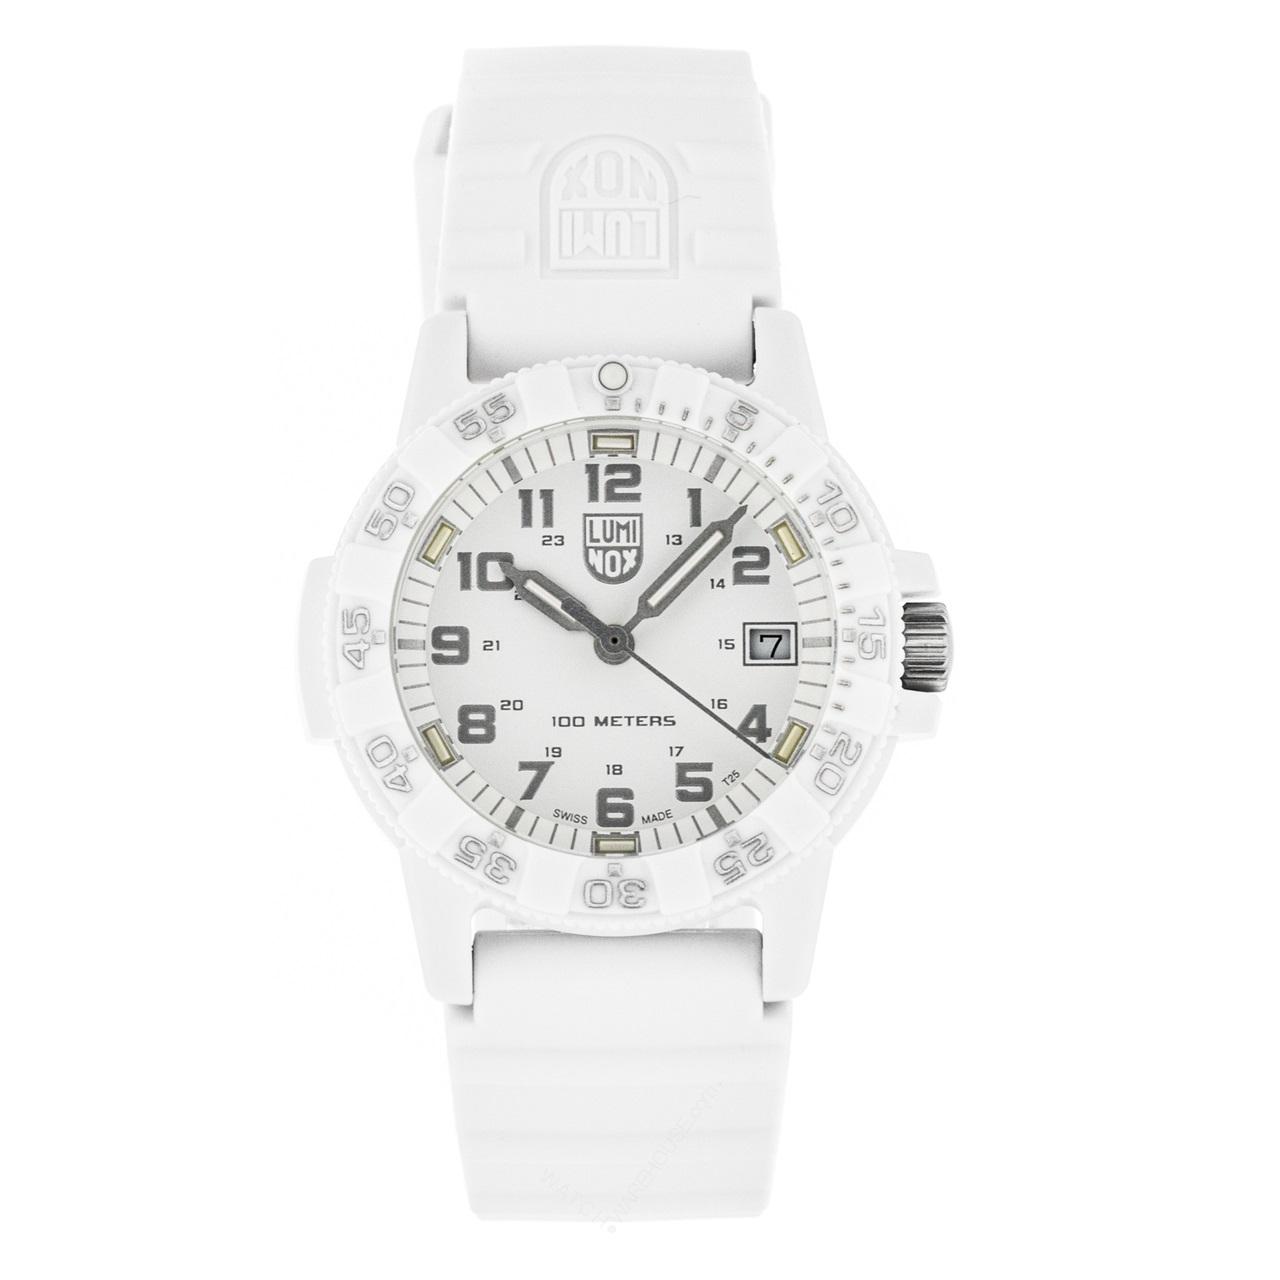 ساعت مچی عقربه ای مردانه لومینوکس مدل XS.0307.WO